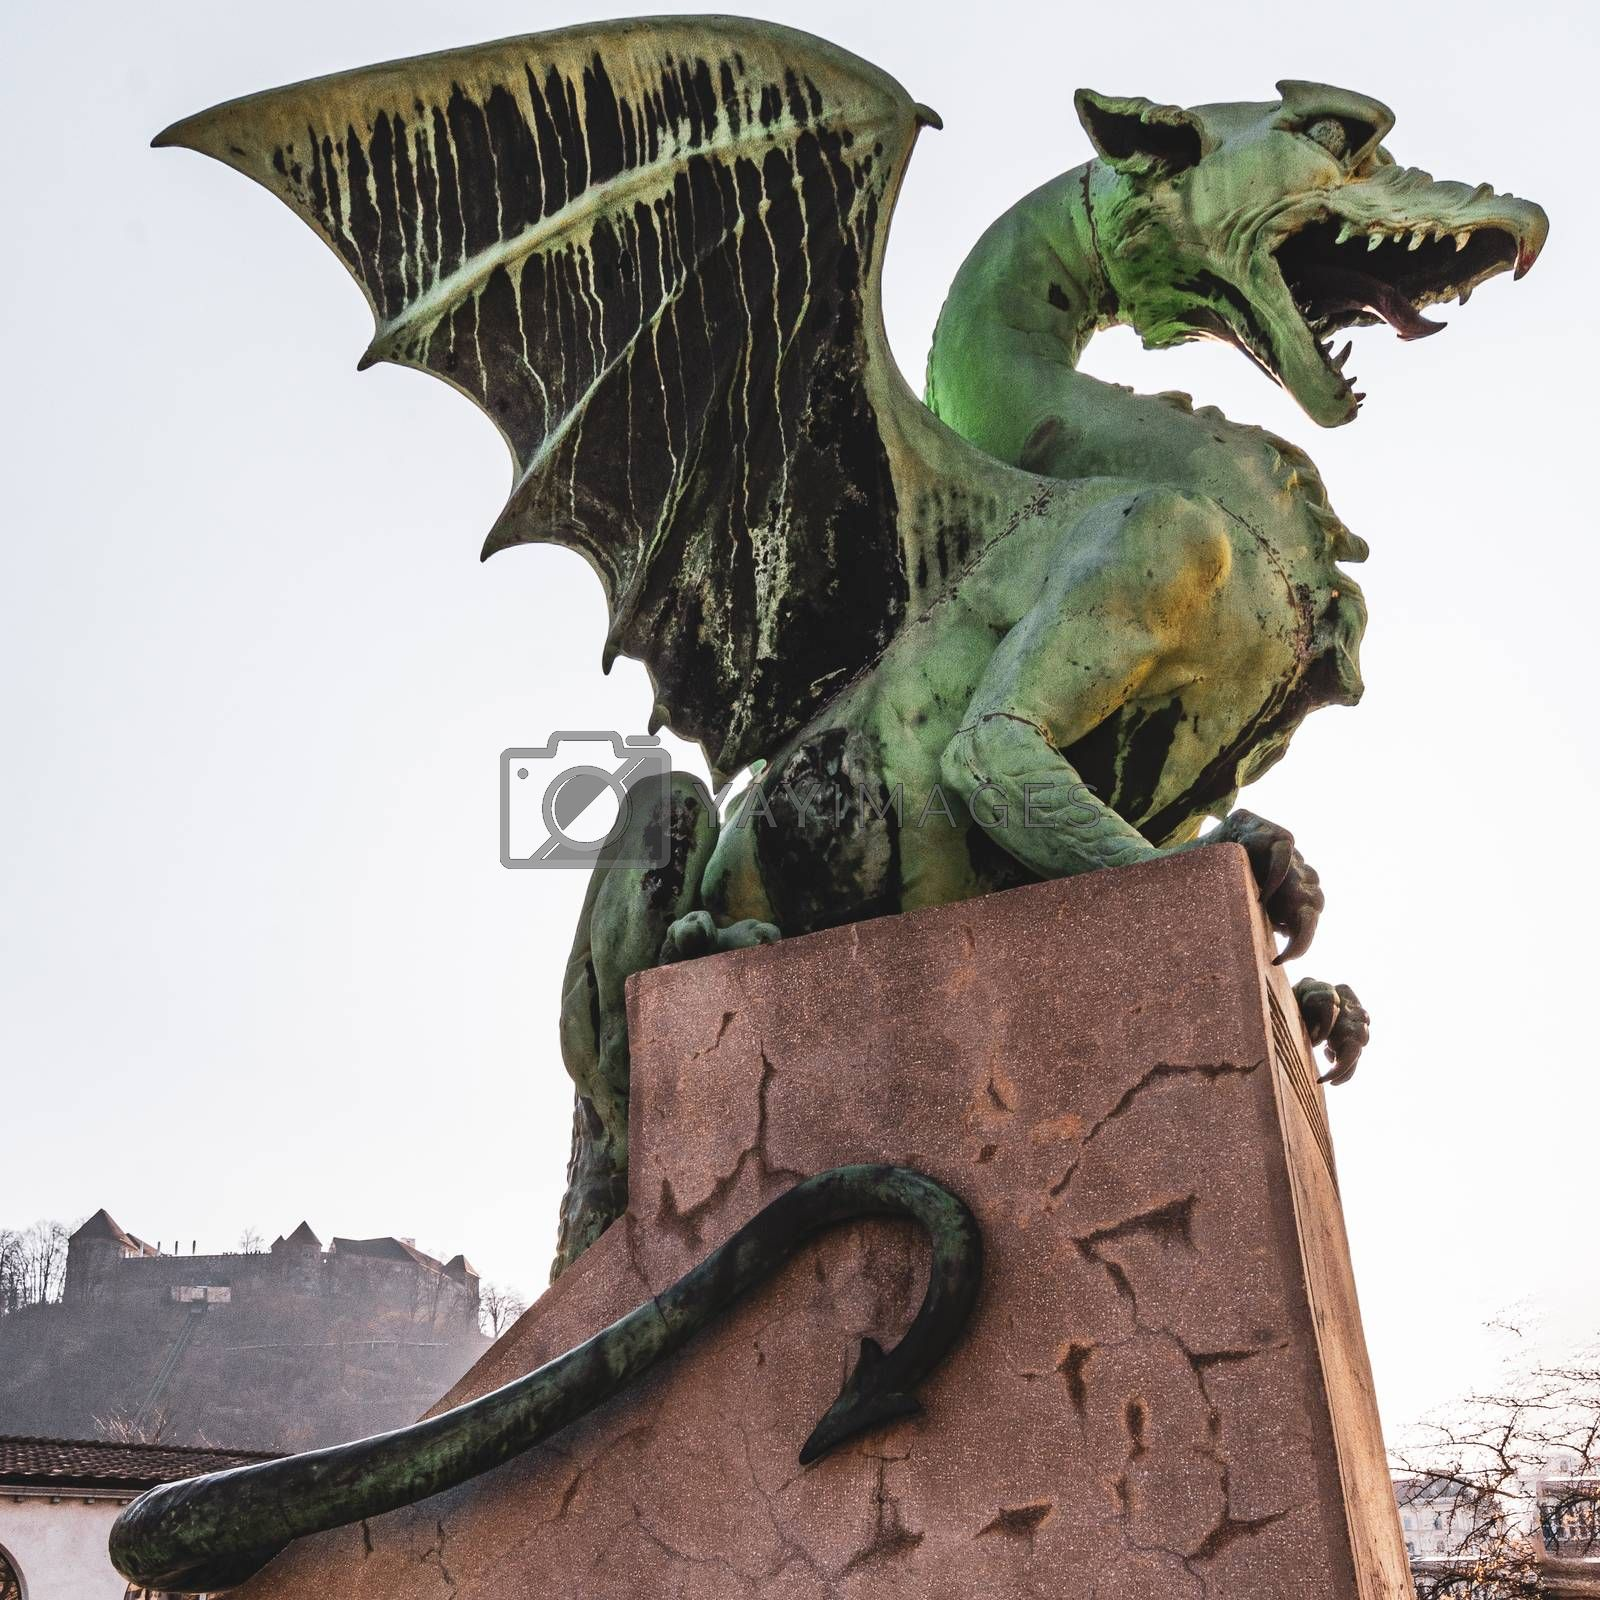 Dragon on the Ljubljana bridge in Slovenia by brambillasimone